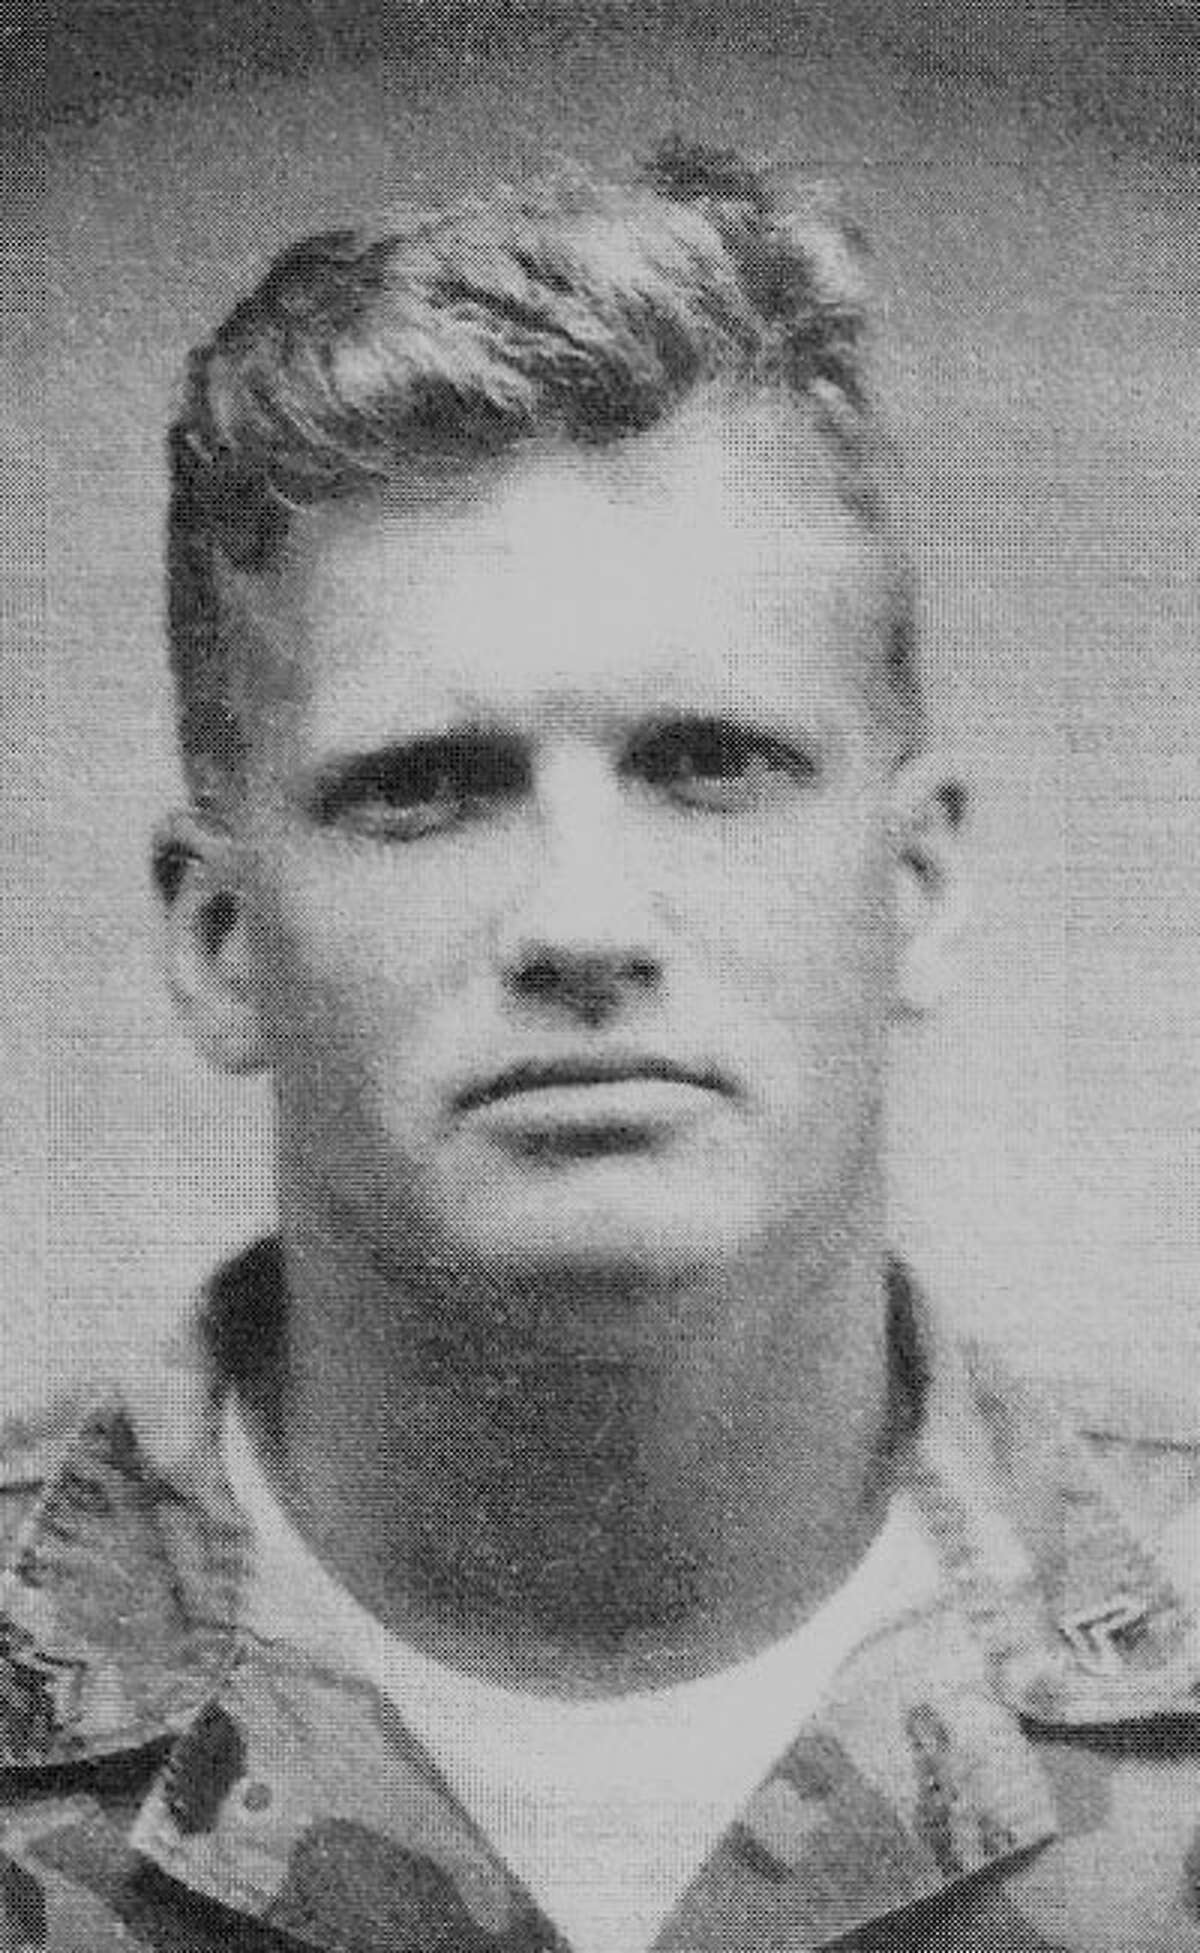 Drew Carey - (U.S. Marines Corps) He served six years in the United States Marine Corps Reserve. www.military.com